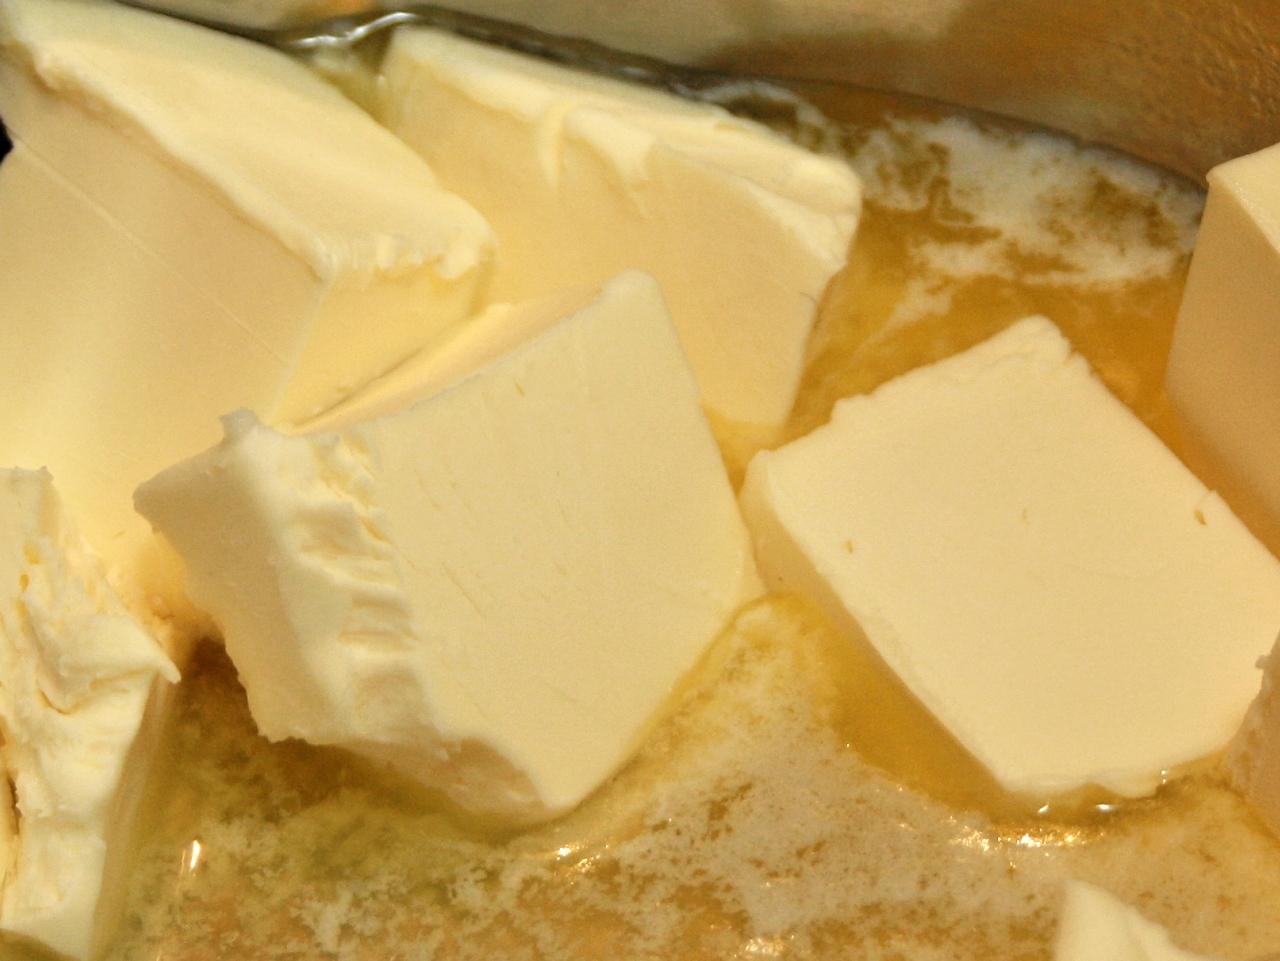 Chunks of creamy yellow butter